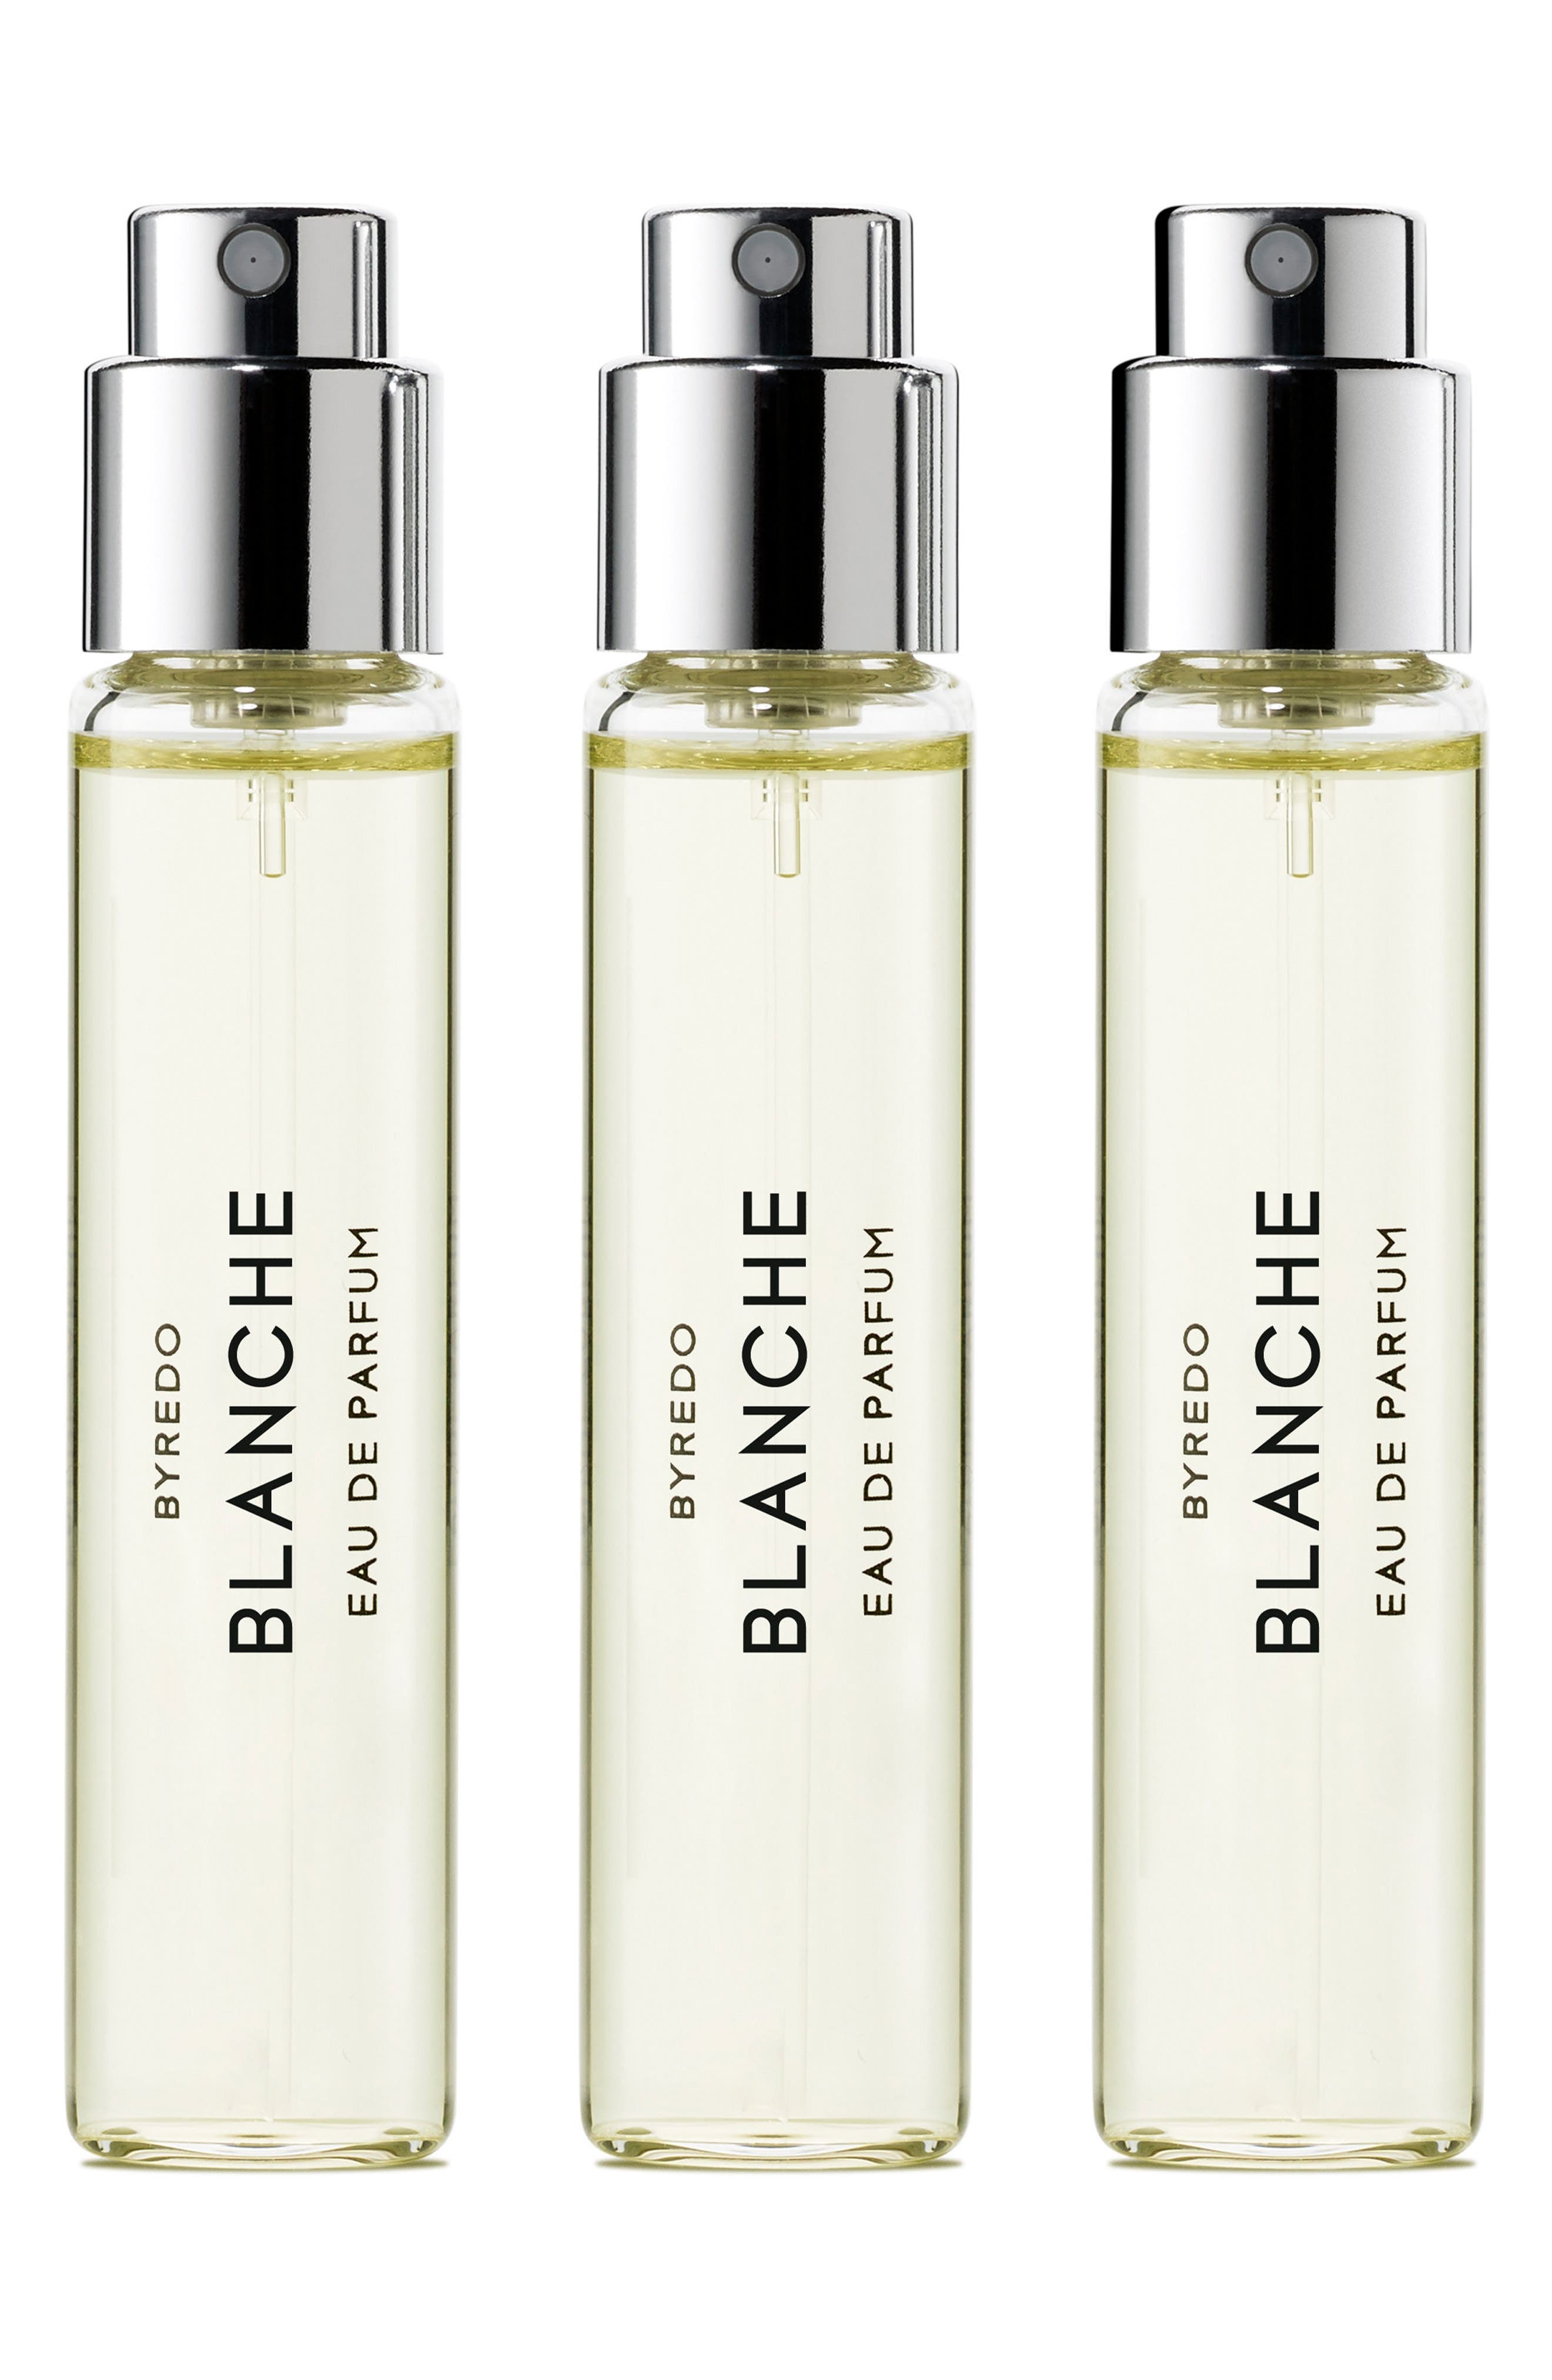 Main Image - BYREDO Blanche Eau de Parfum Travel Spray Trio